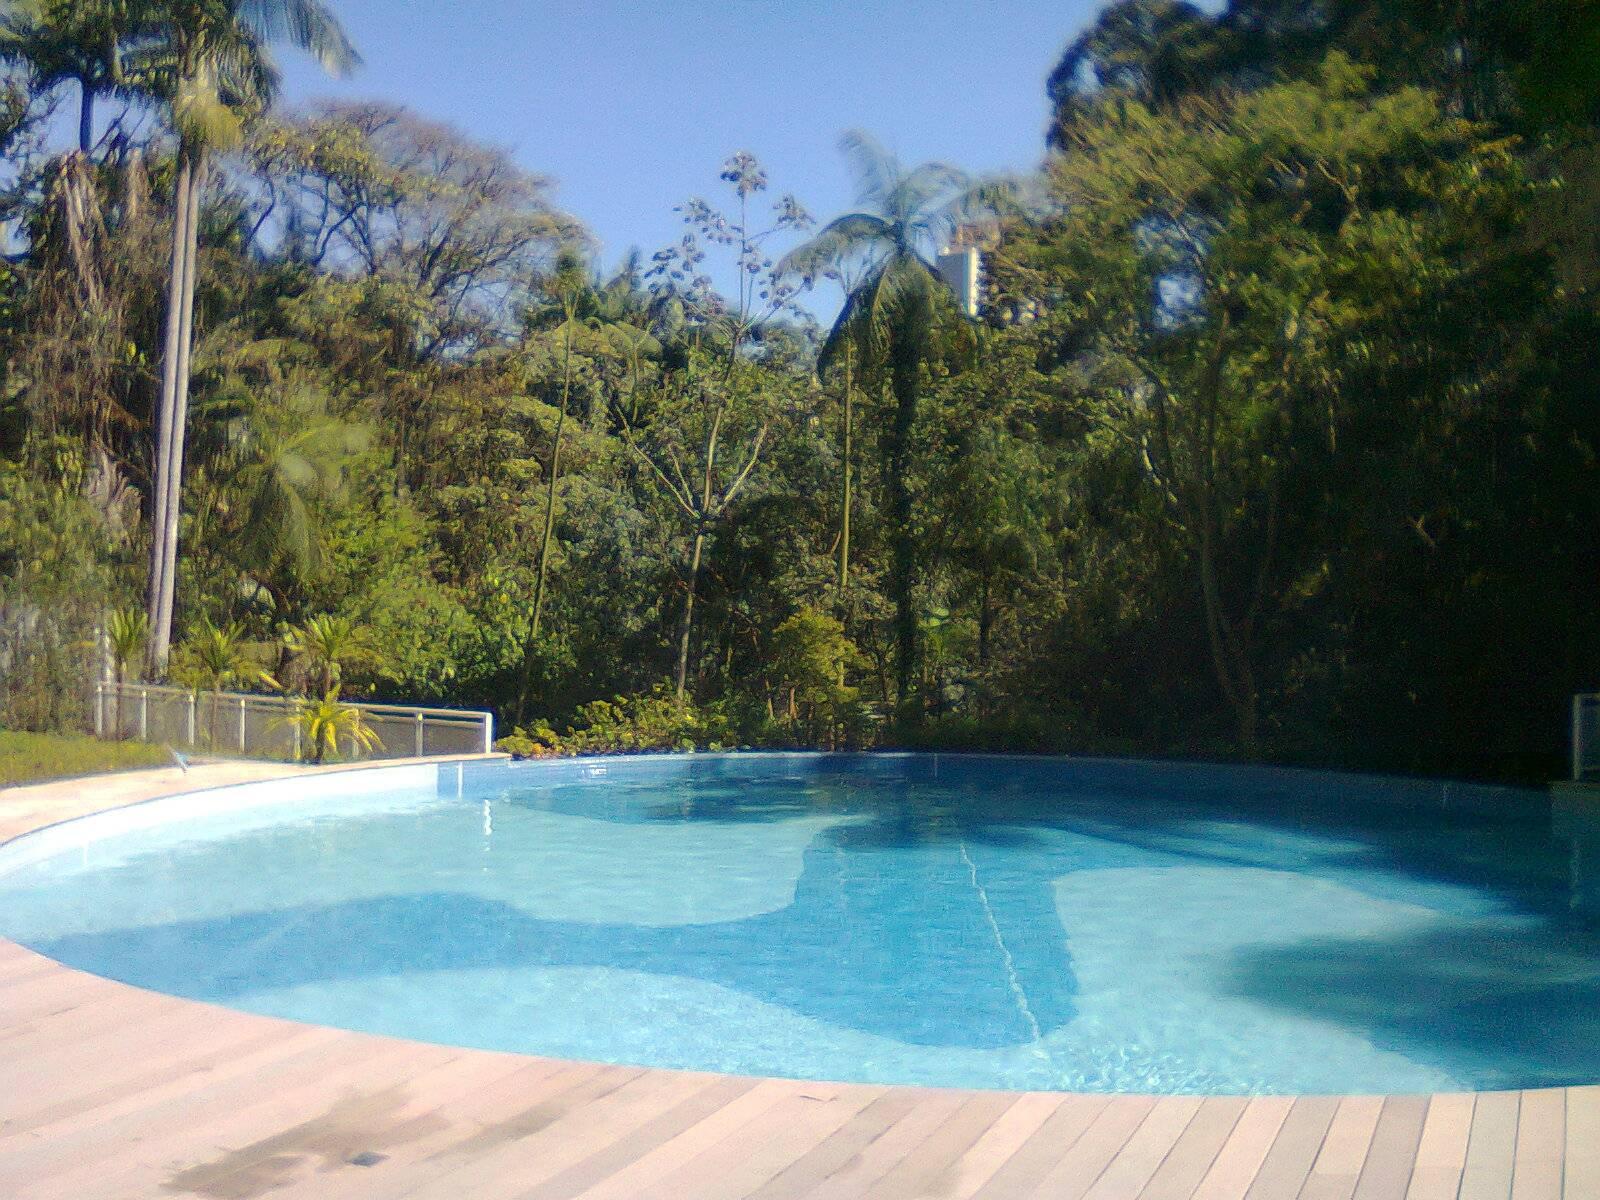 Cursos no Jardim Tropical - Curso Limpeza de Piscinas